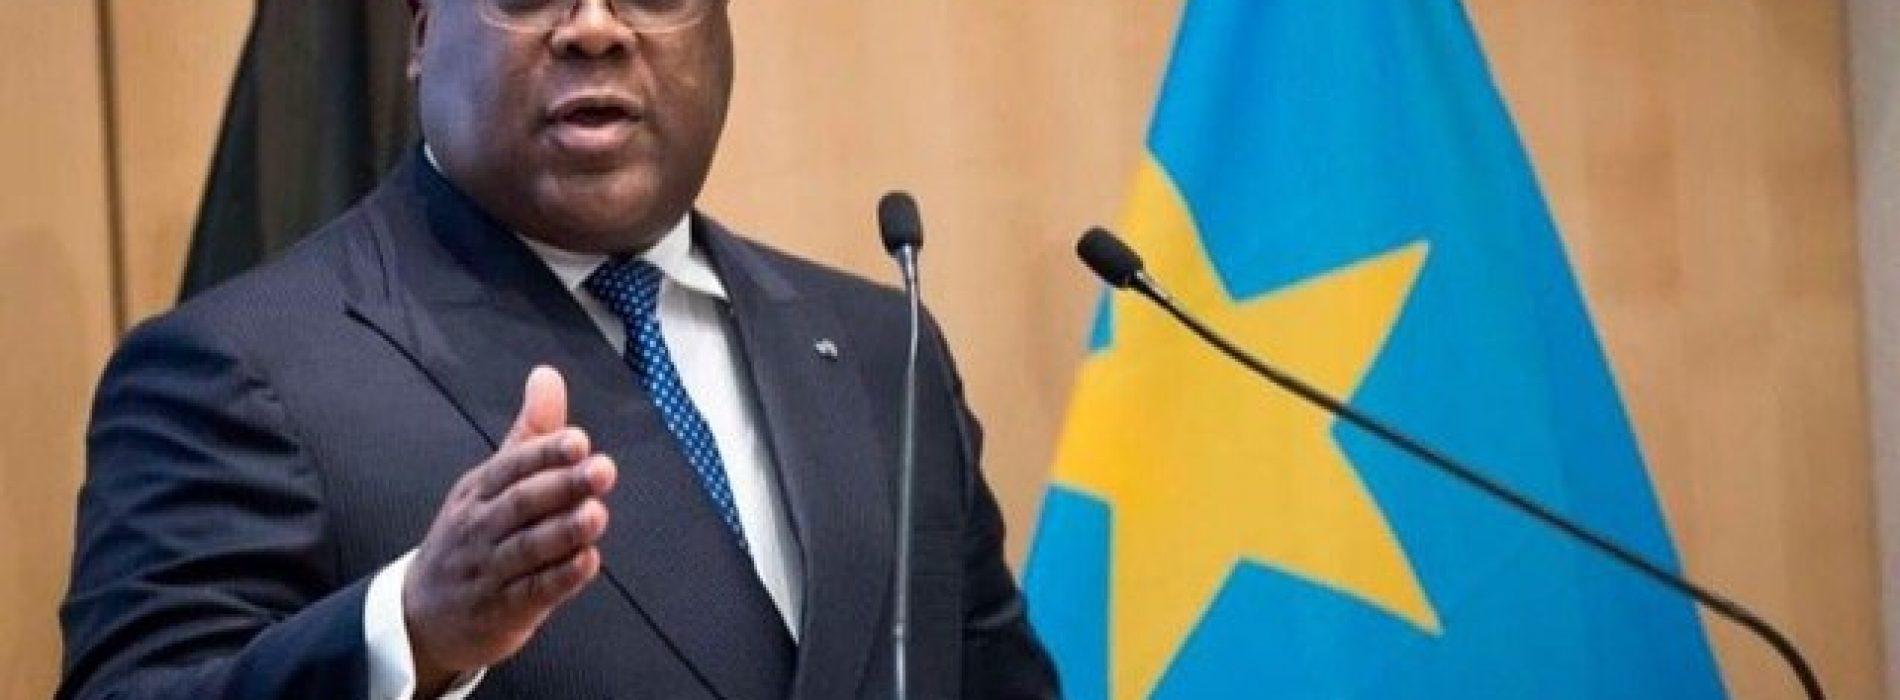 RDC: Tshisekedi si affida al premier Lukonde per una leadership senza intoppi